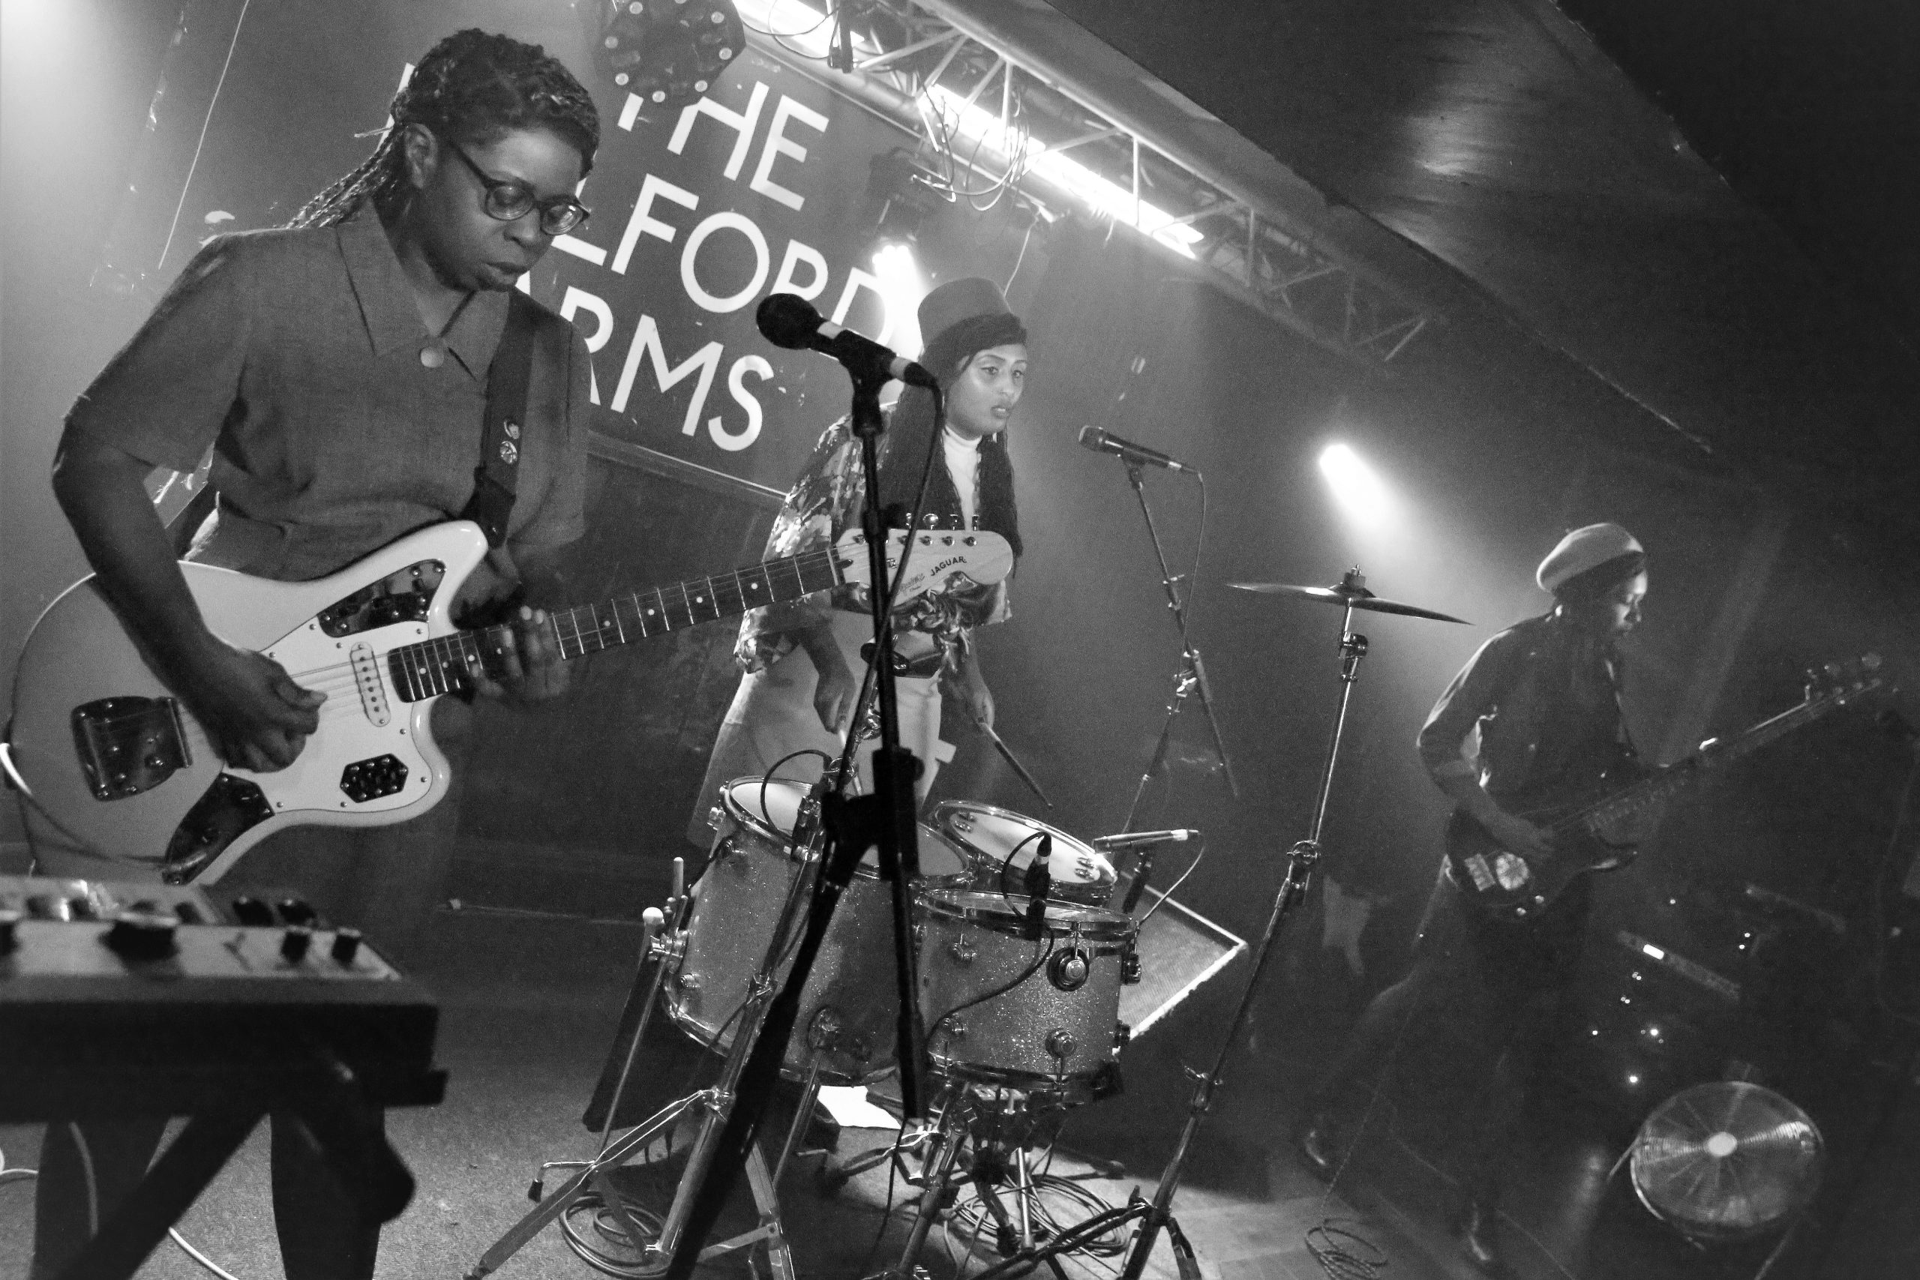 Big Joanie – The Fulford Arms, York, 22/11/2019